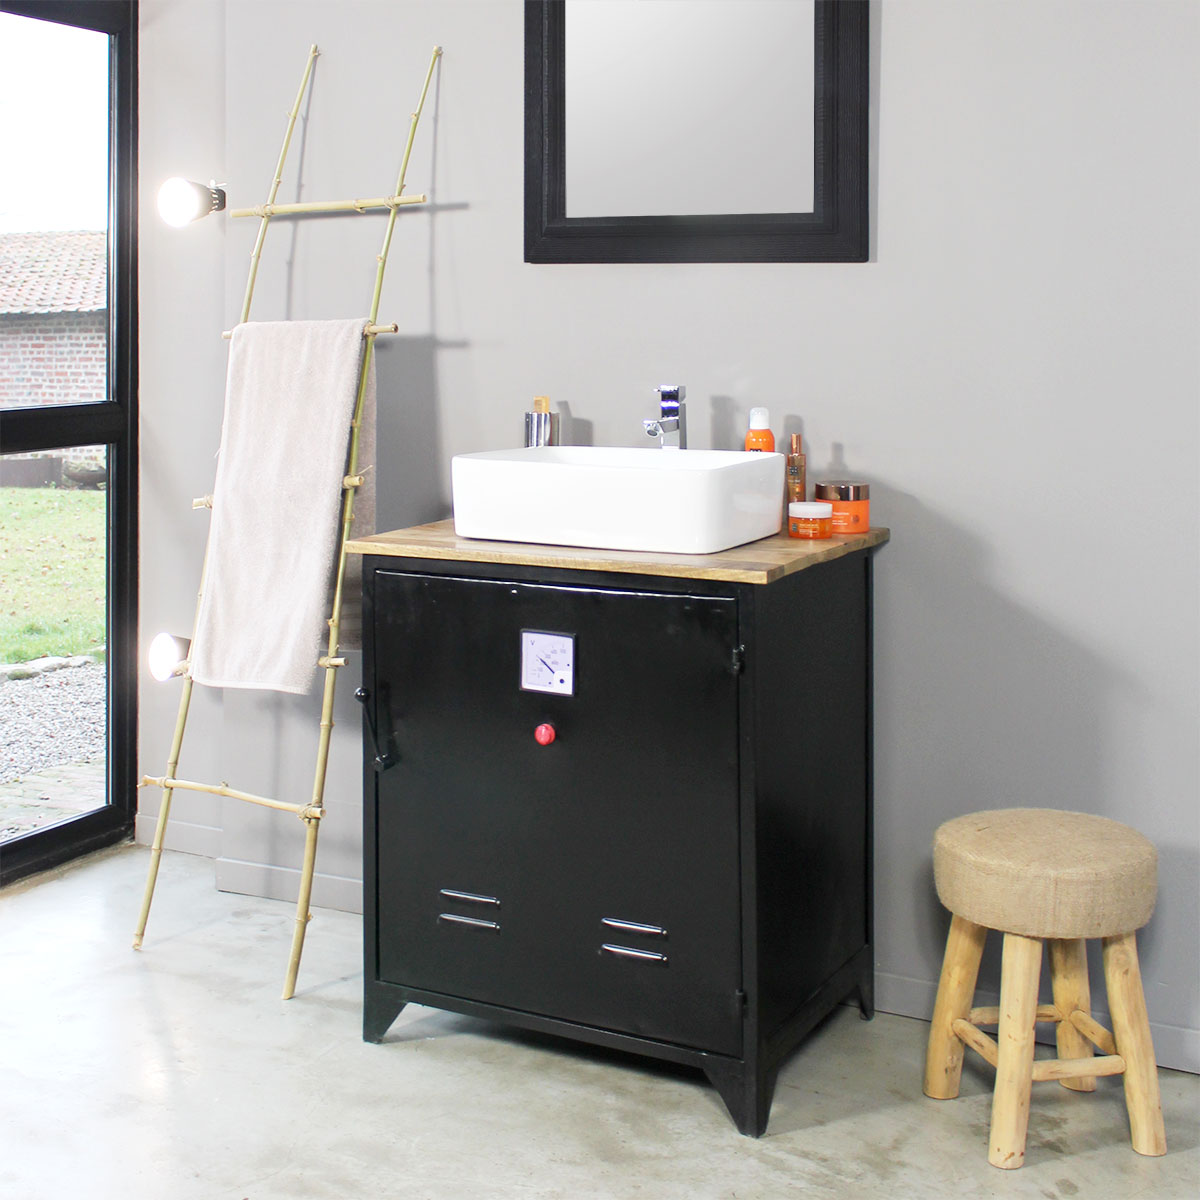 Conseils d co pour choisir son meuble salle de bain metal le blog d co de made in meubles - Duo mobilier design gagnant jangir maddadi ...